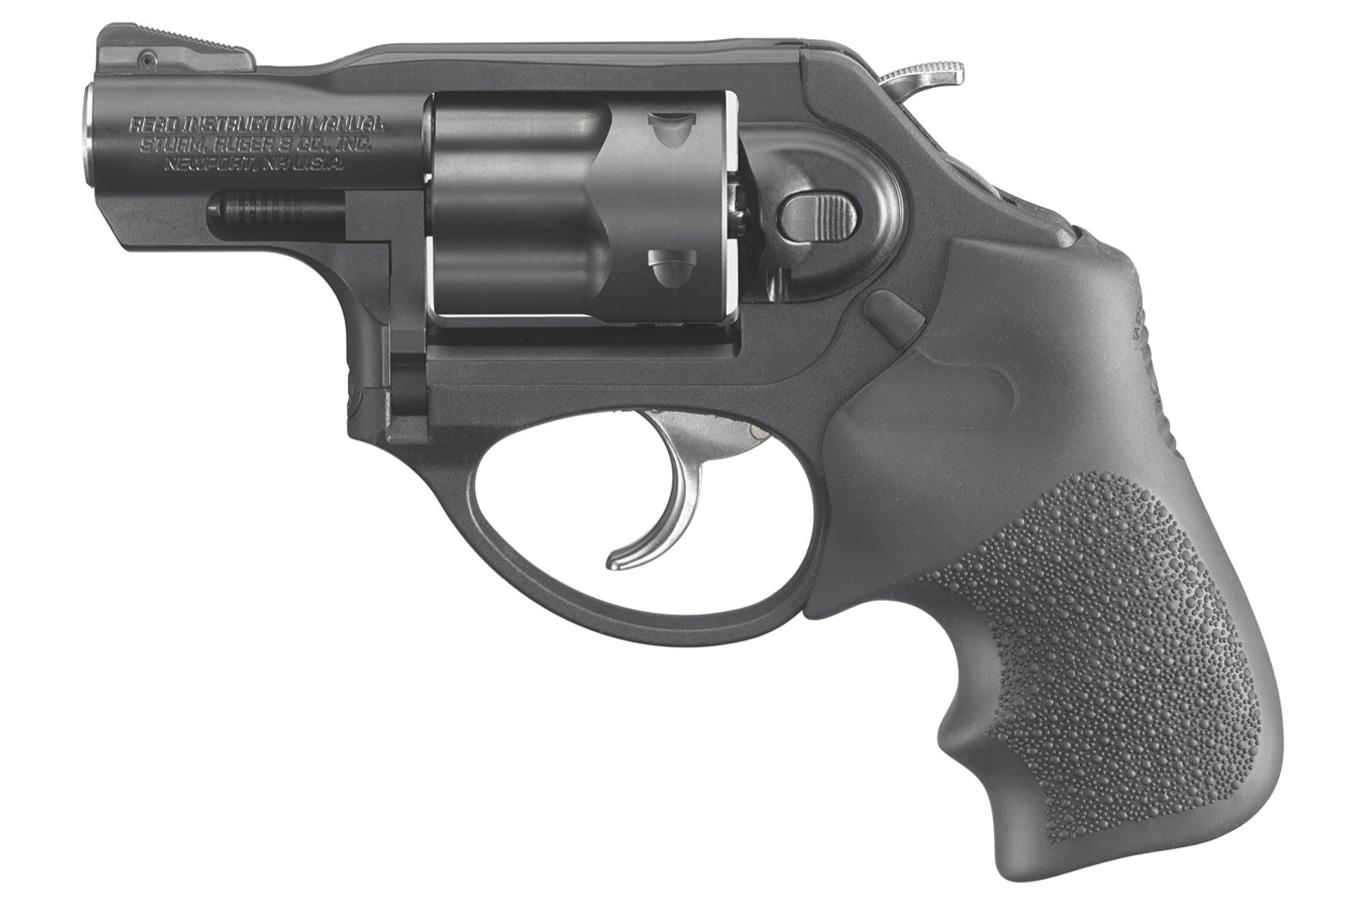 ruger lcr revolver special action double hammer spec 38spl bignami external bvs sportsman superstore cz